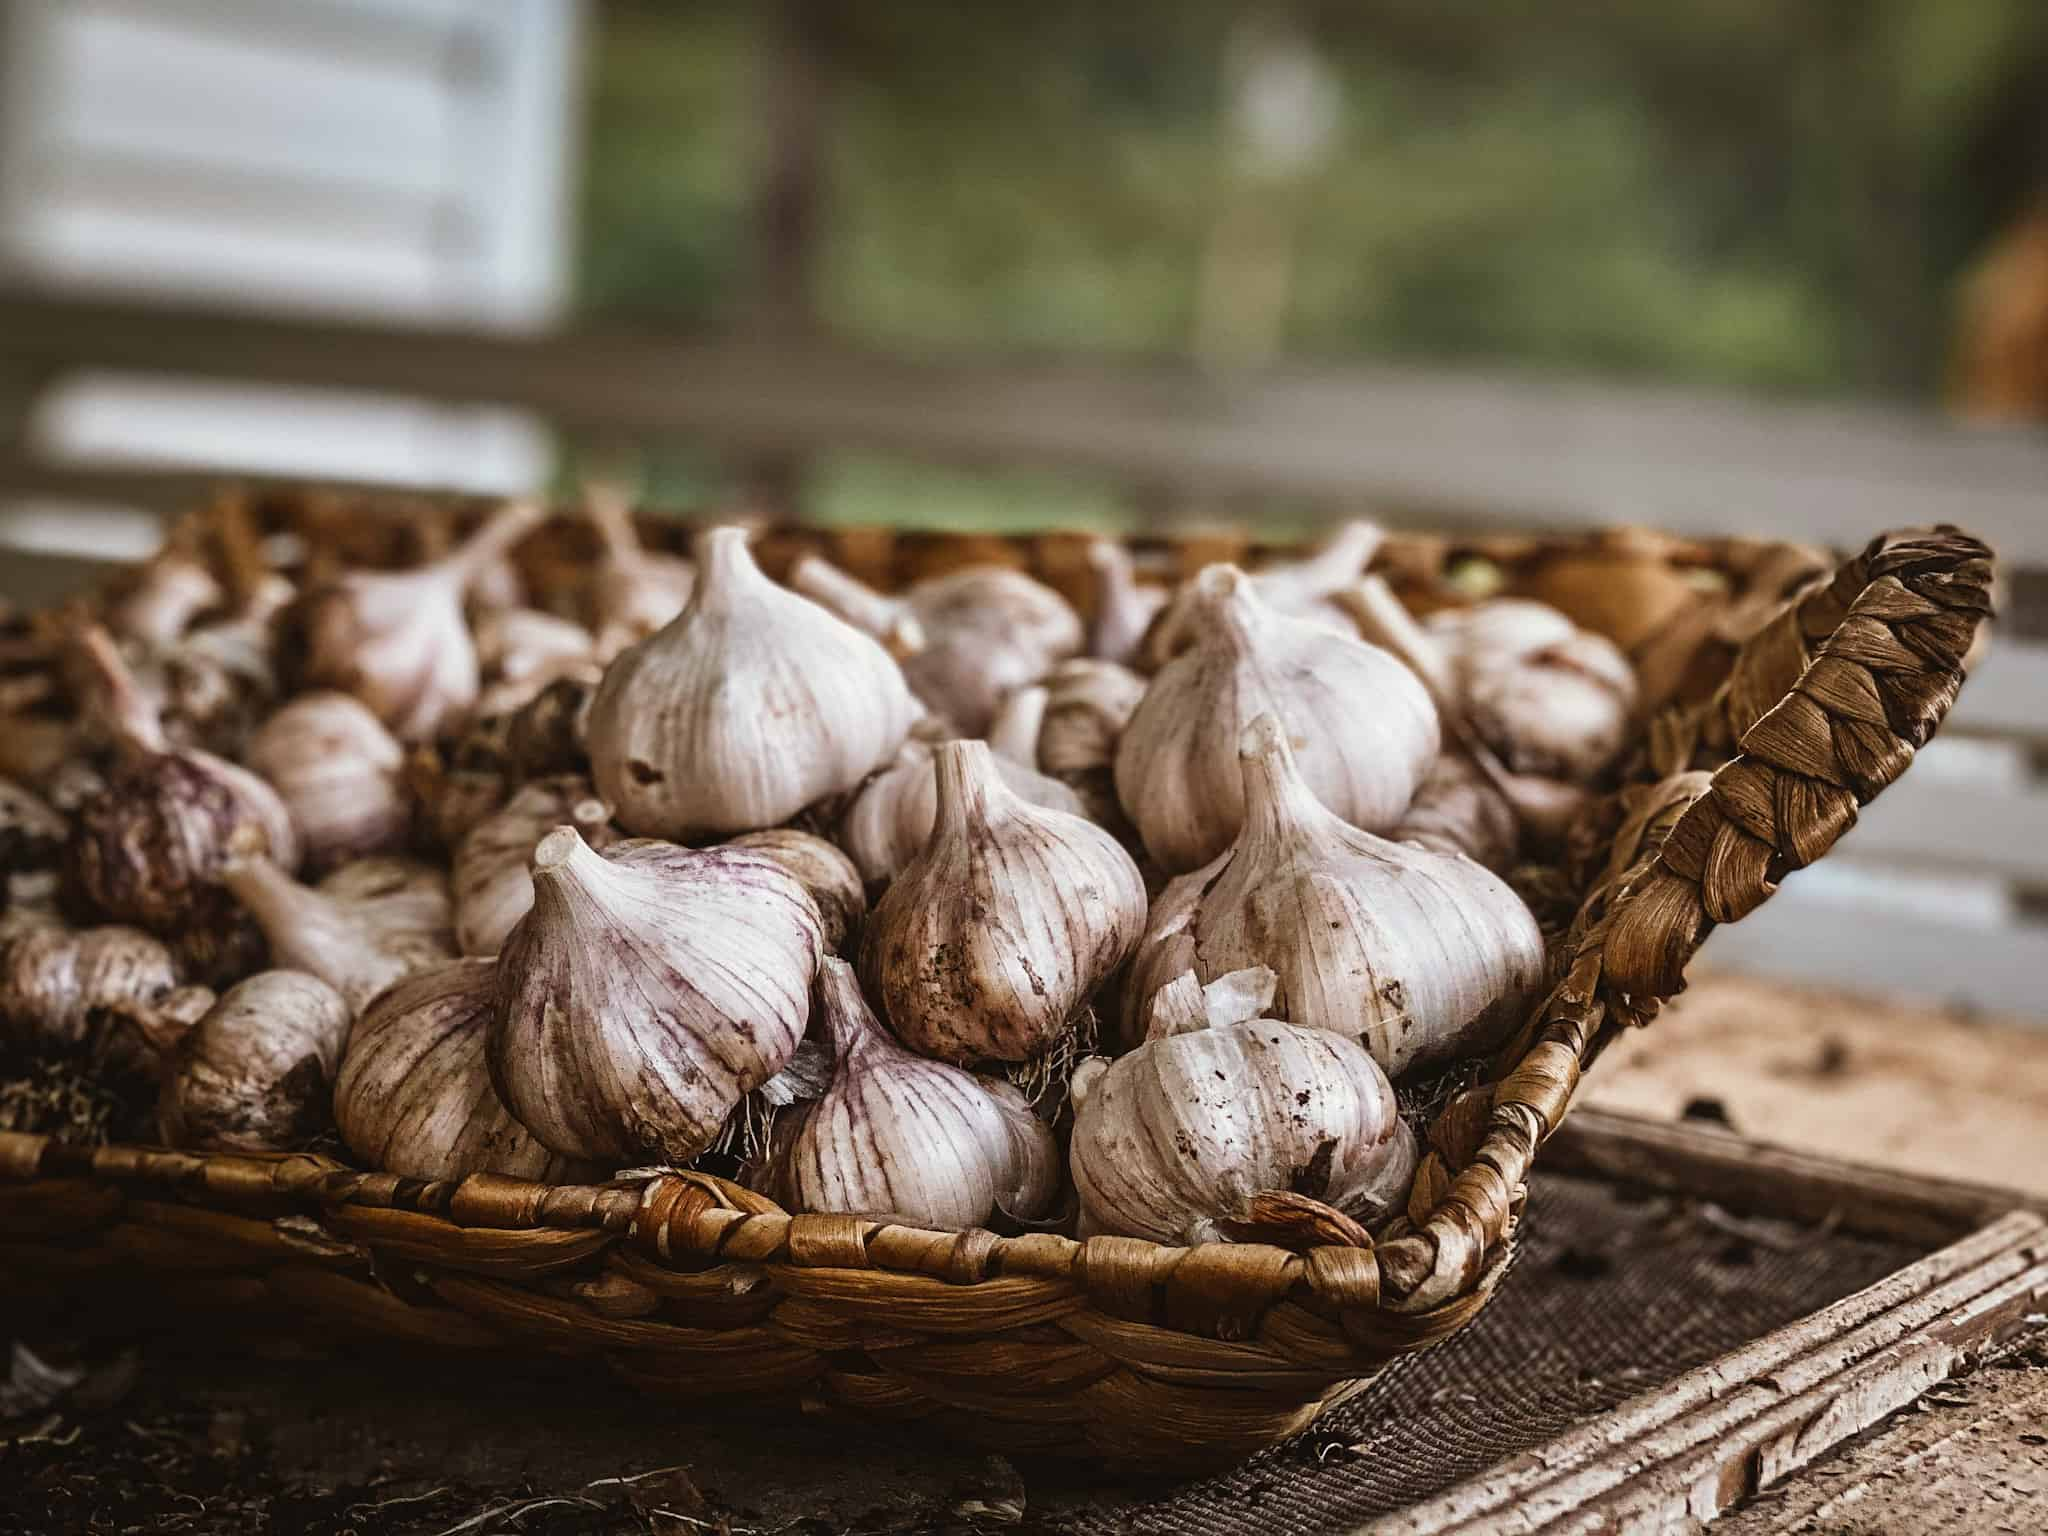 garlic cloves in woven basket